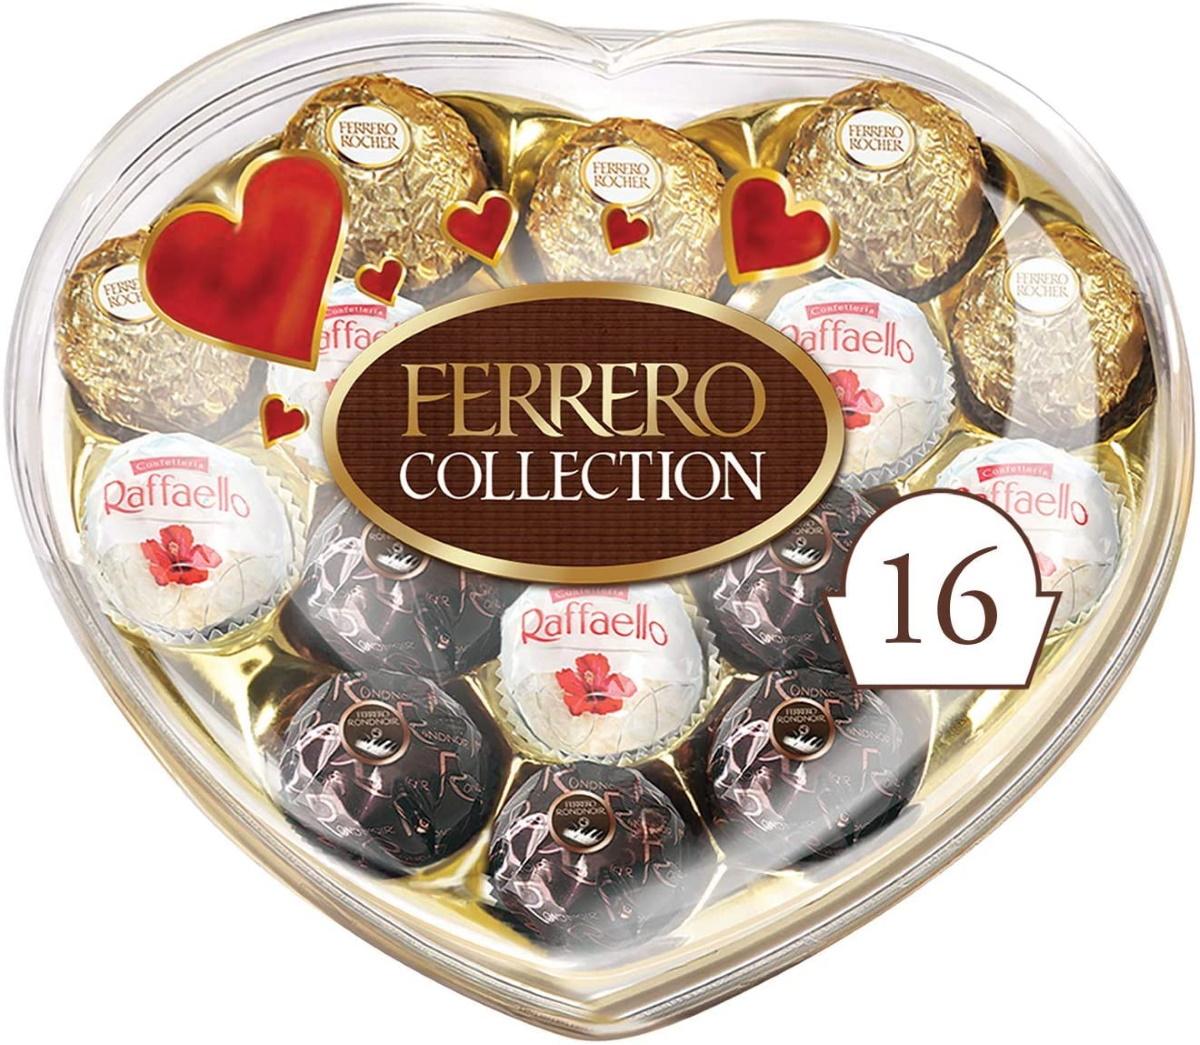 Ferrero Rocher Collection Gift Box